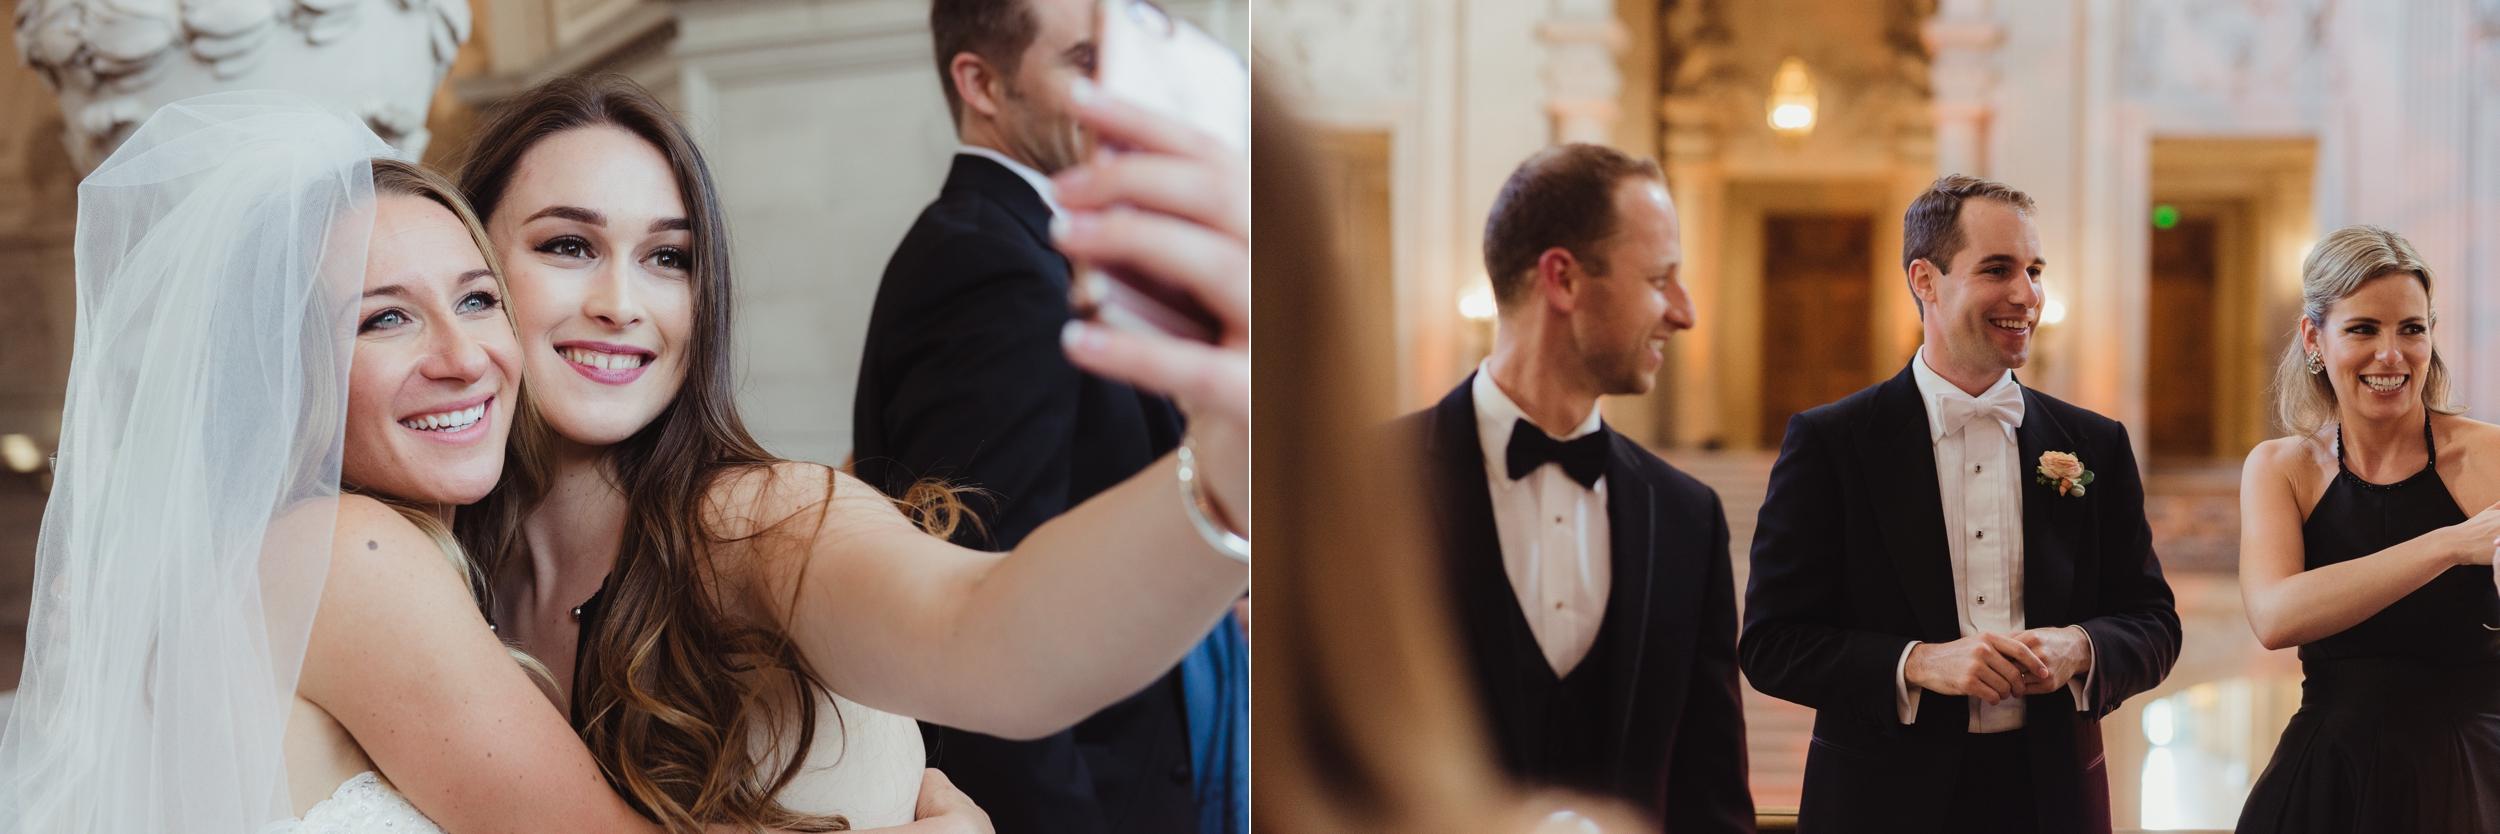 61-elegant-san-francisco-city-hall-wedding-vivianchen-0733_WEB.jpg